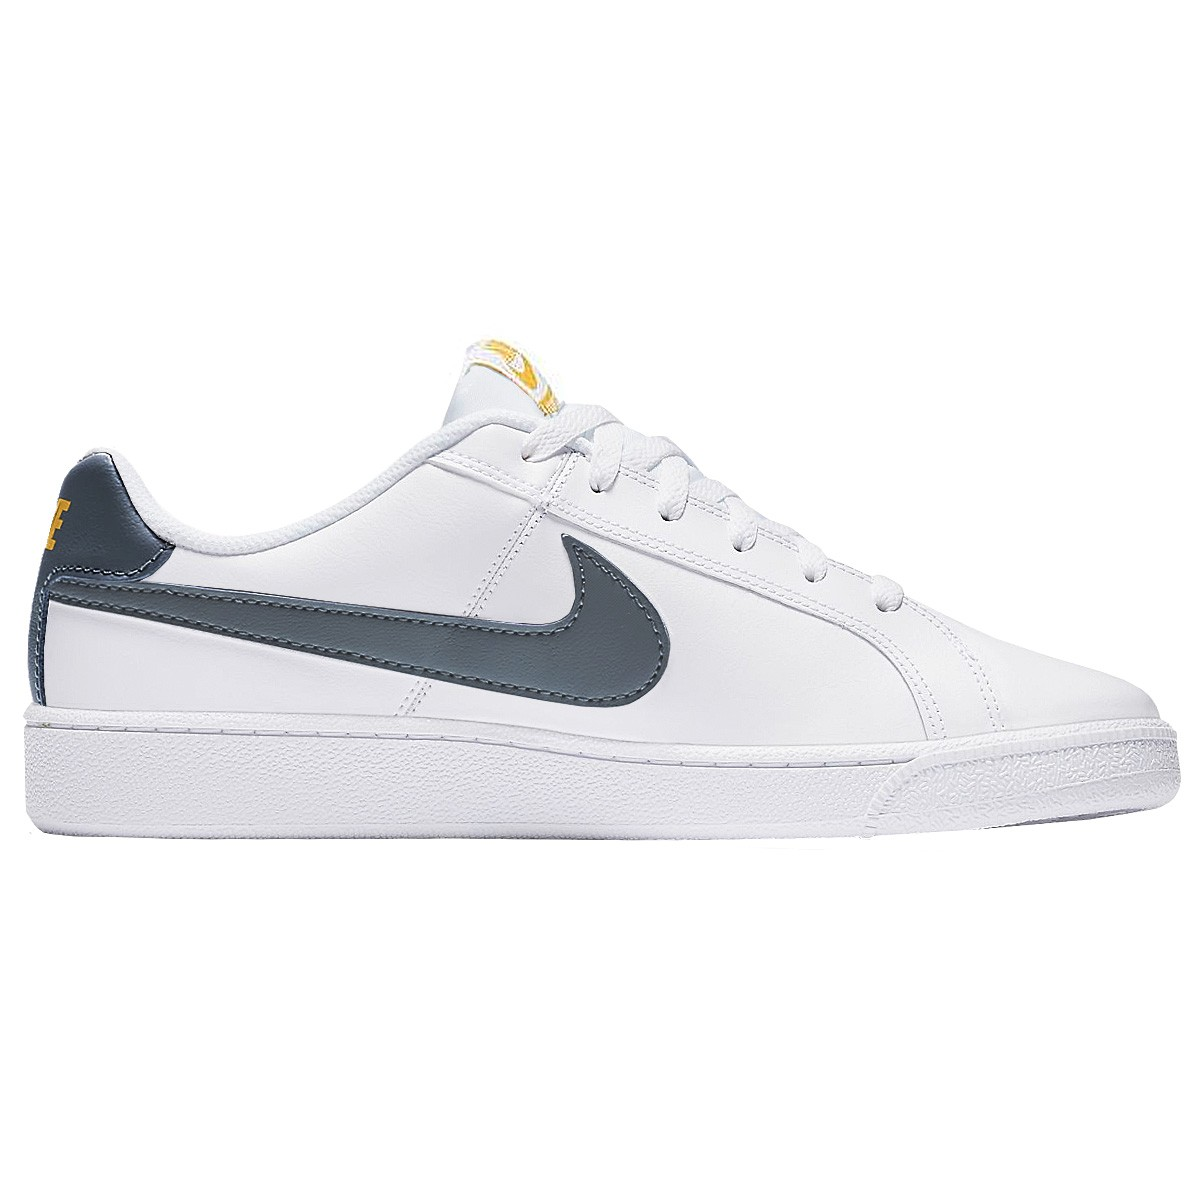 332ca2873 Sneakers Nike Court Royale Man white-grey